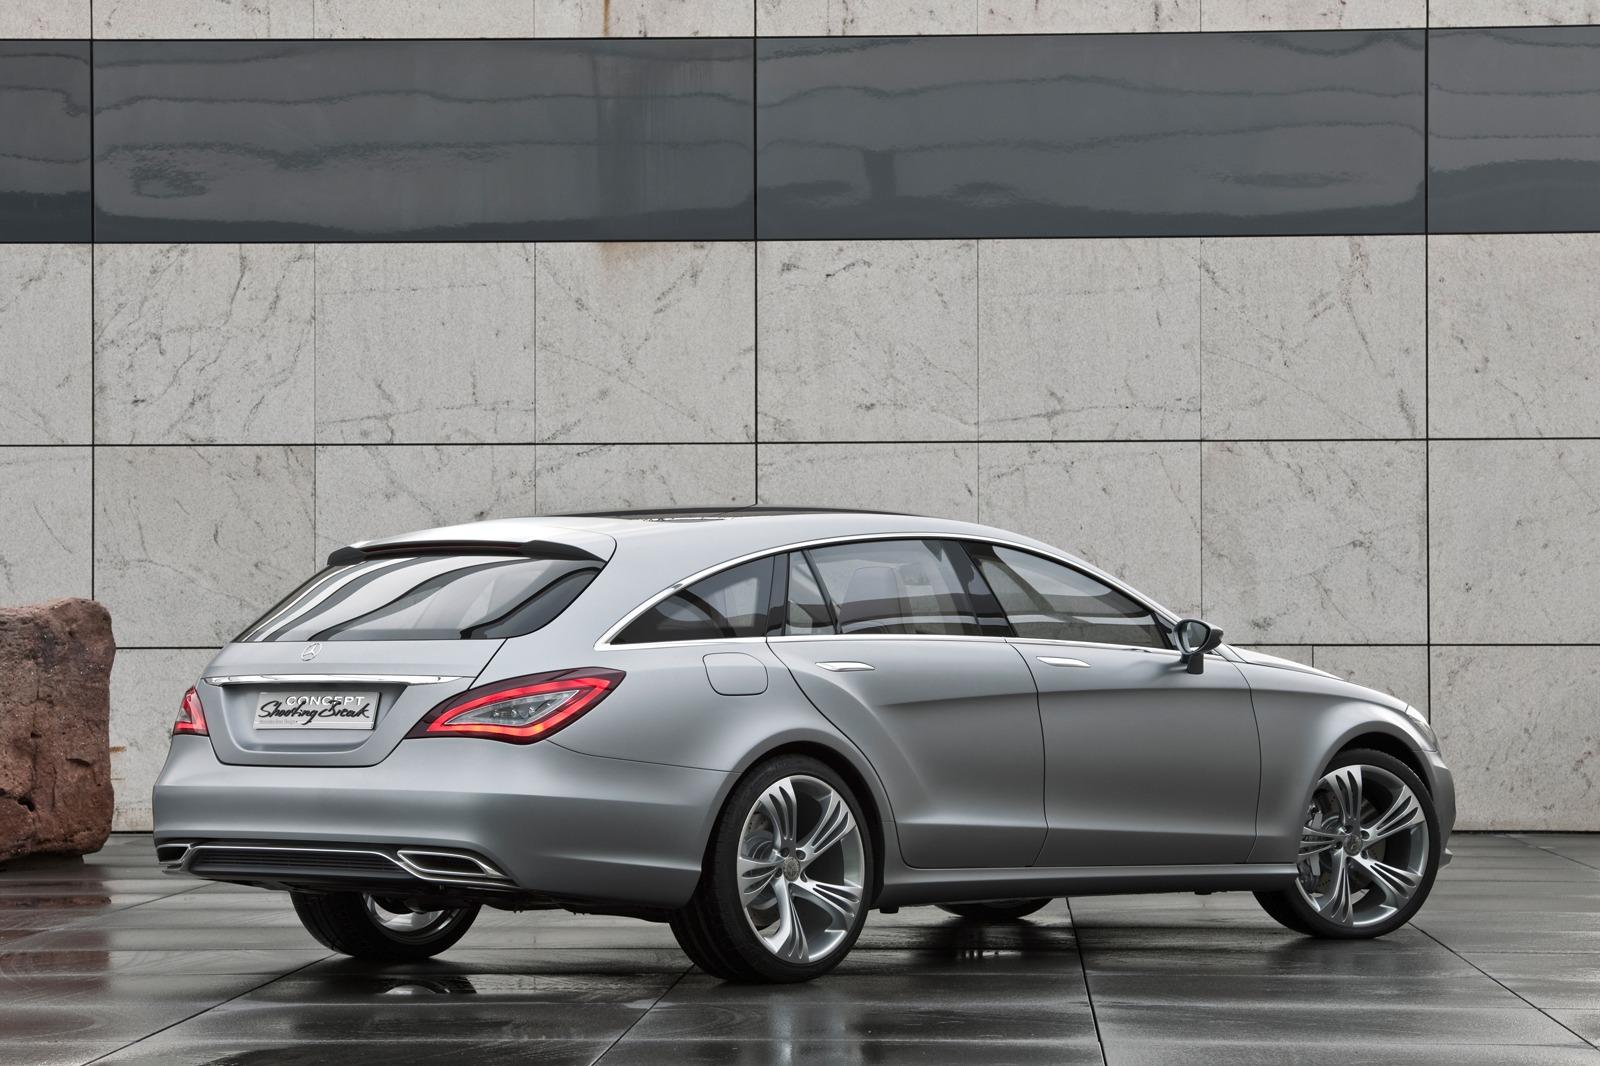 Mercedes-CLS-Shooting-Brake-Concept-2.jpg (1600×1066)